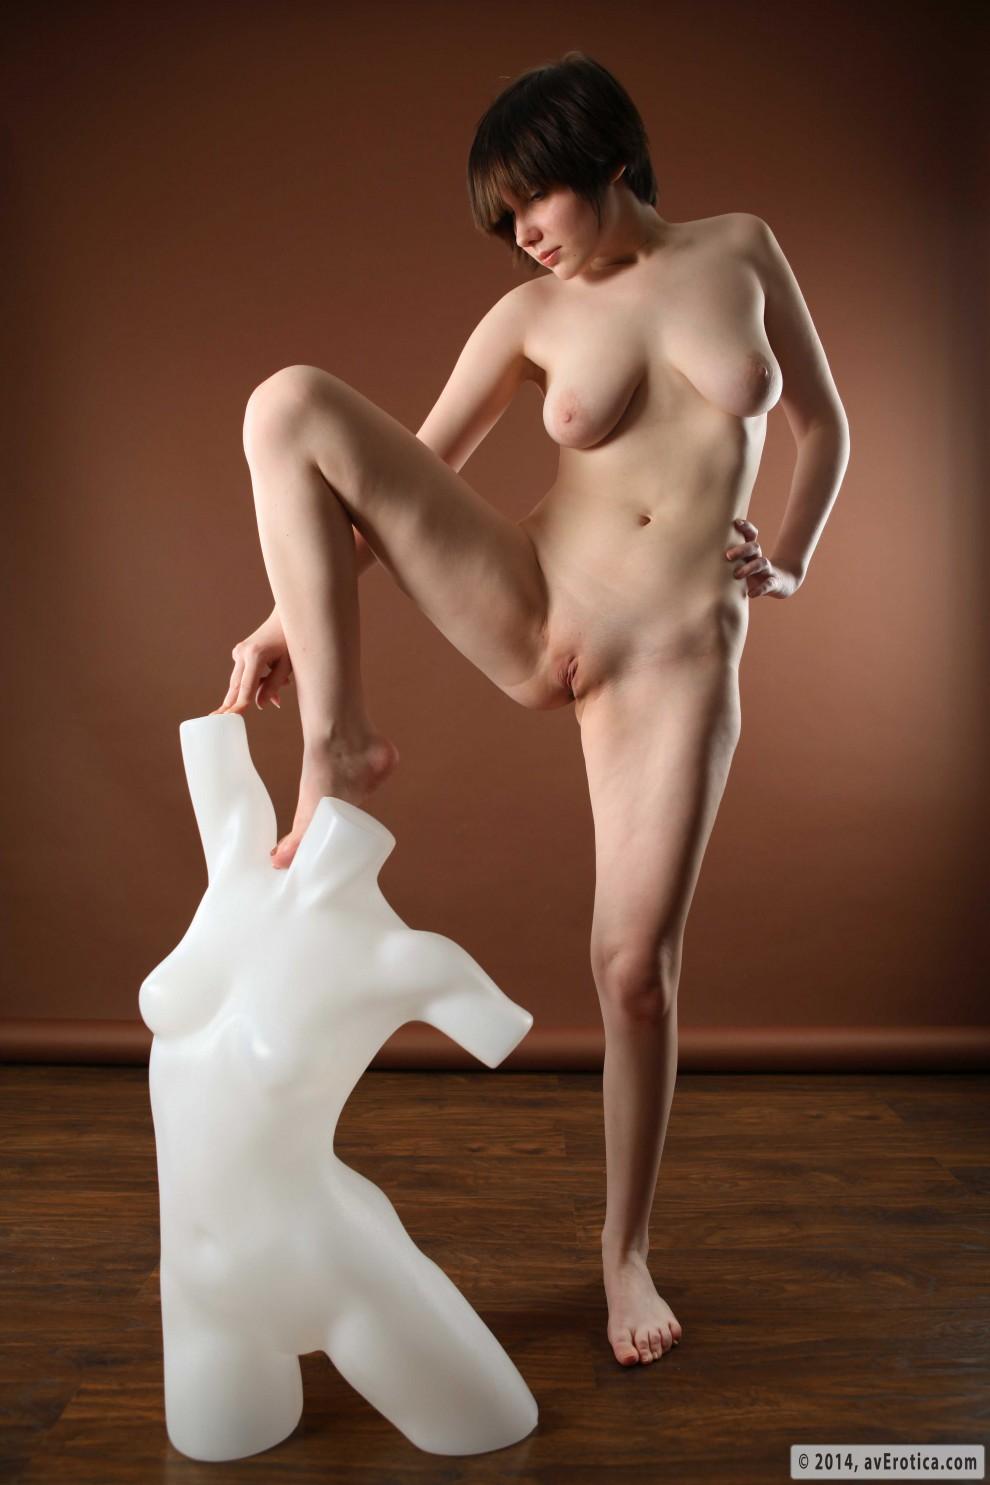 Free erotic poses smut pics